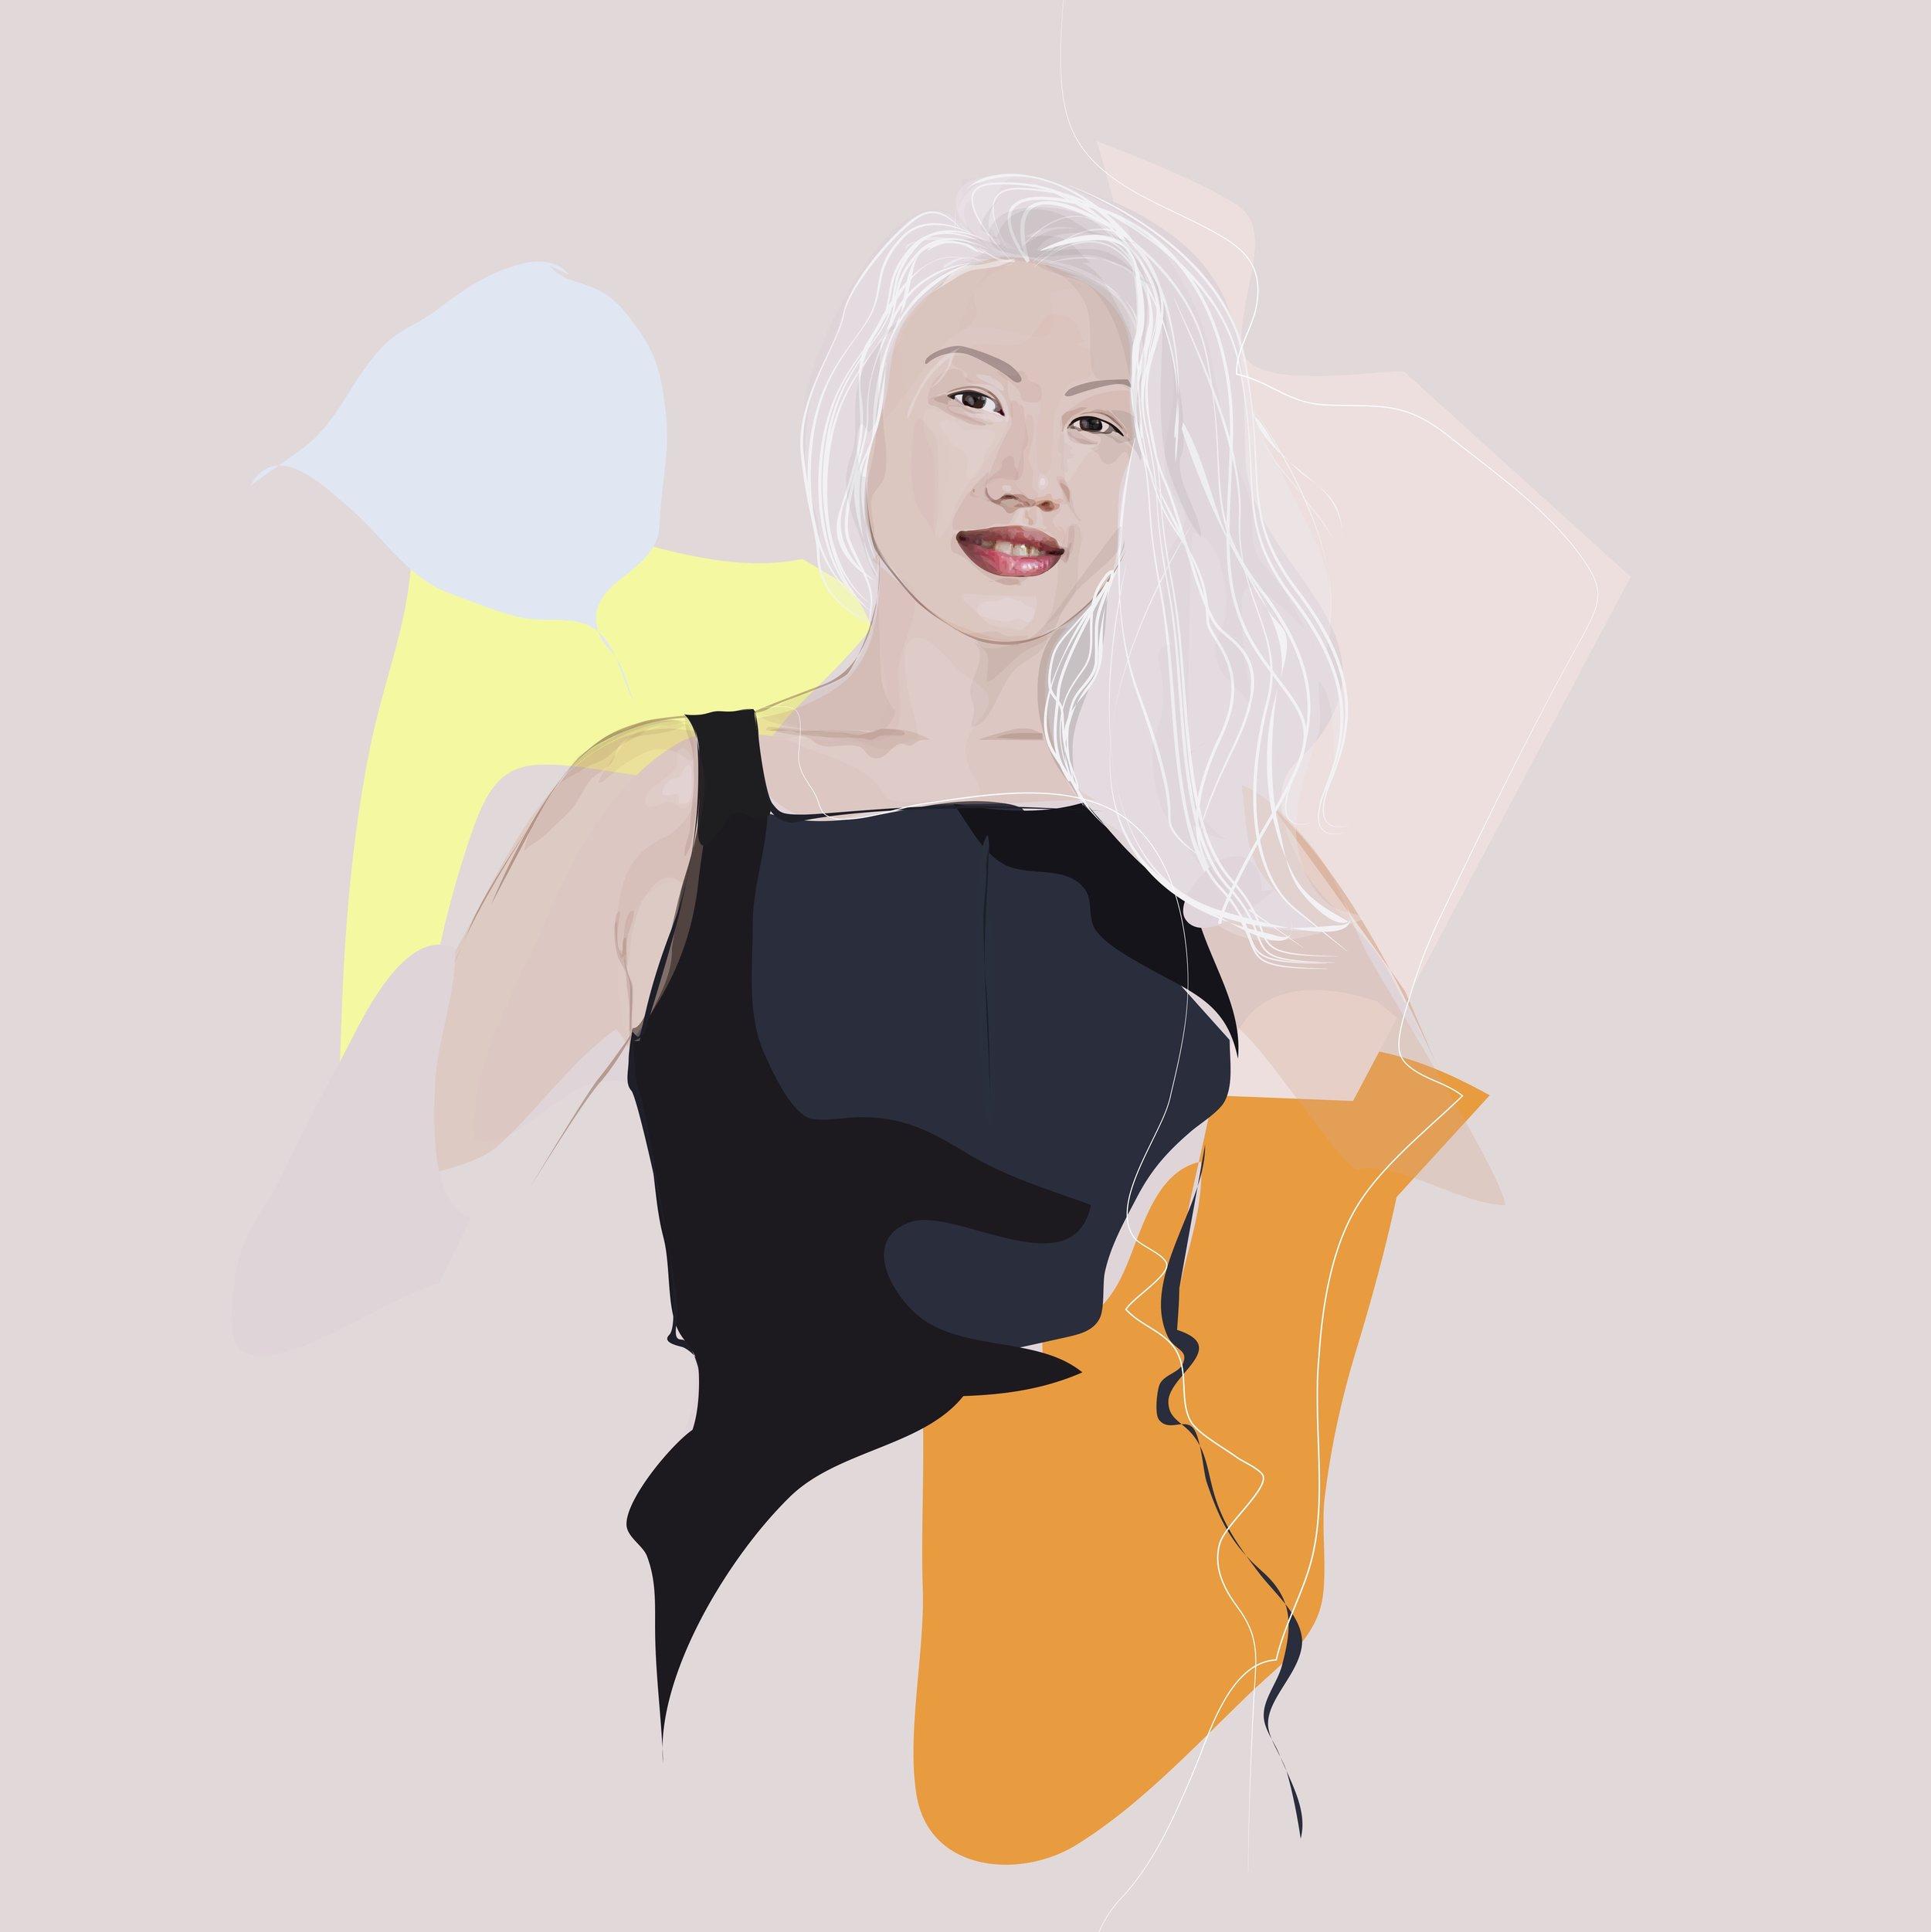 Evelyn Chick x Femme Studios